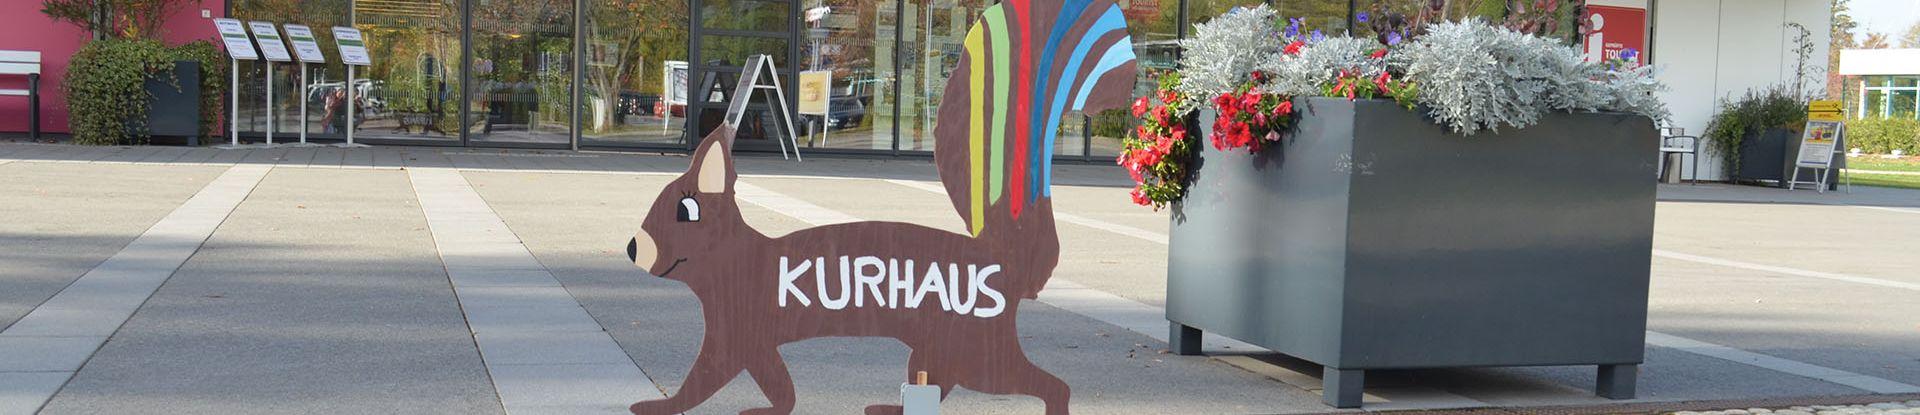 Kurhaus Hans-Hermann zur Kunstaktion